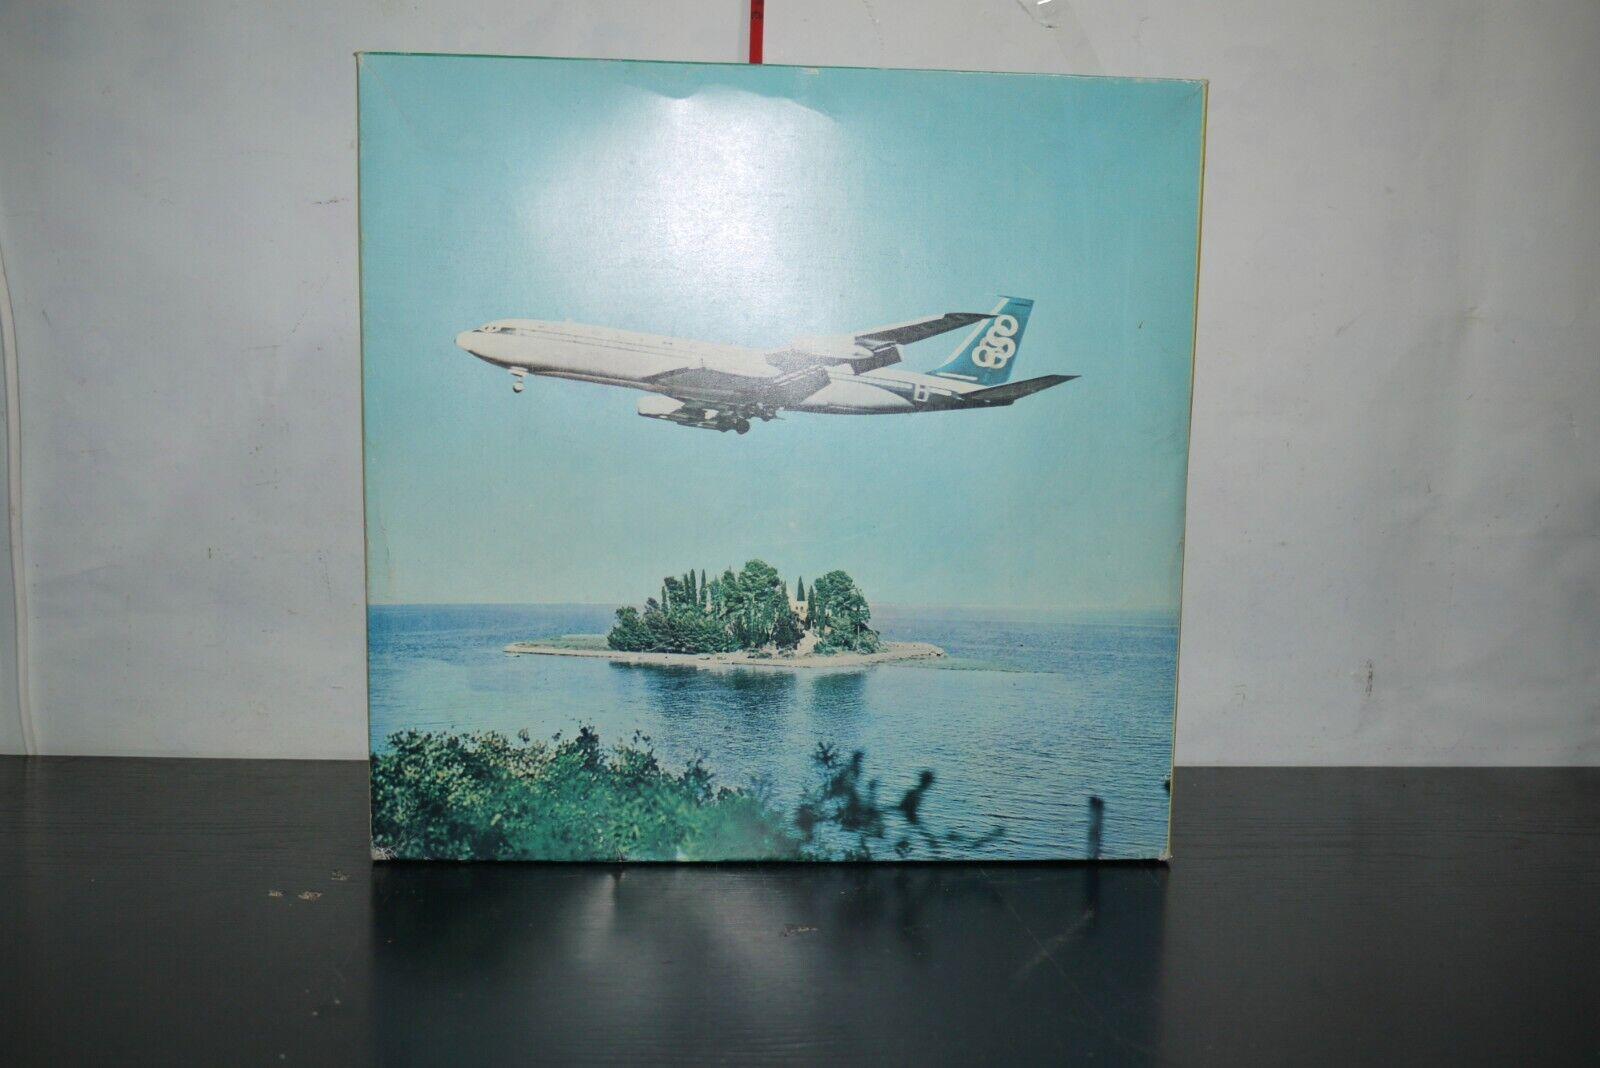 70'S VINTAGE GREEK WIND UP BOEING 707-320 OLYMPIC PLANE BASILIADES 3520 MIB